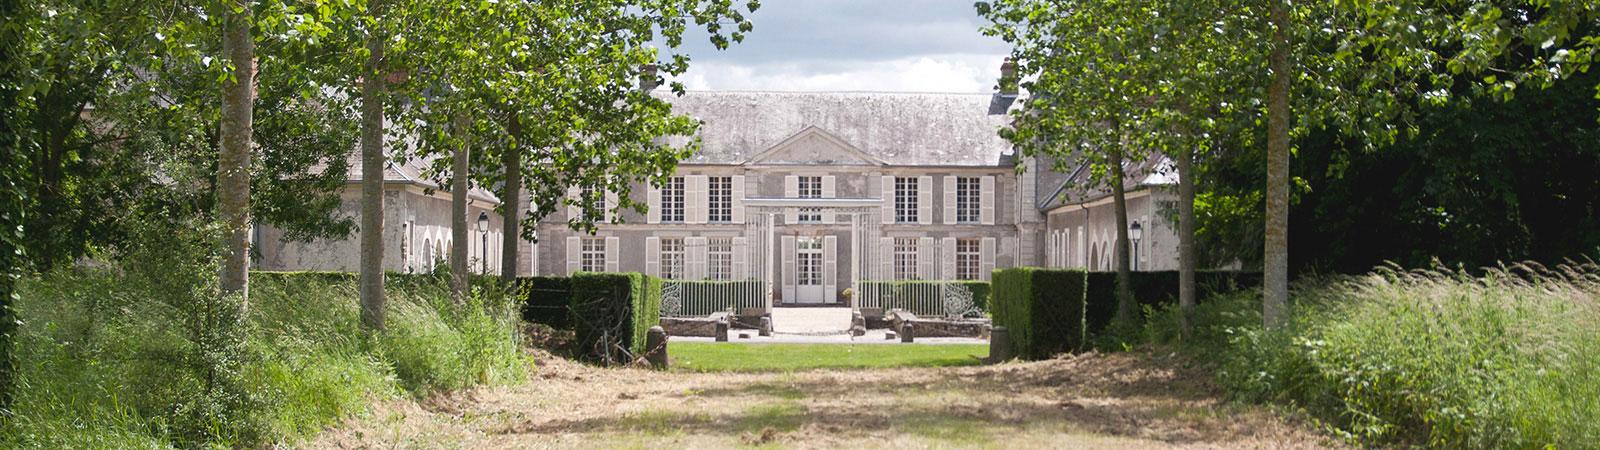 Chateau-de-janvry-1